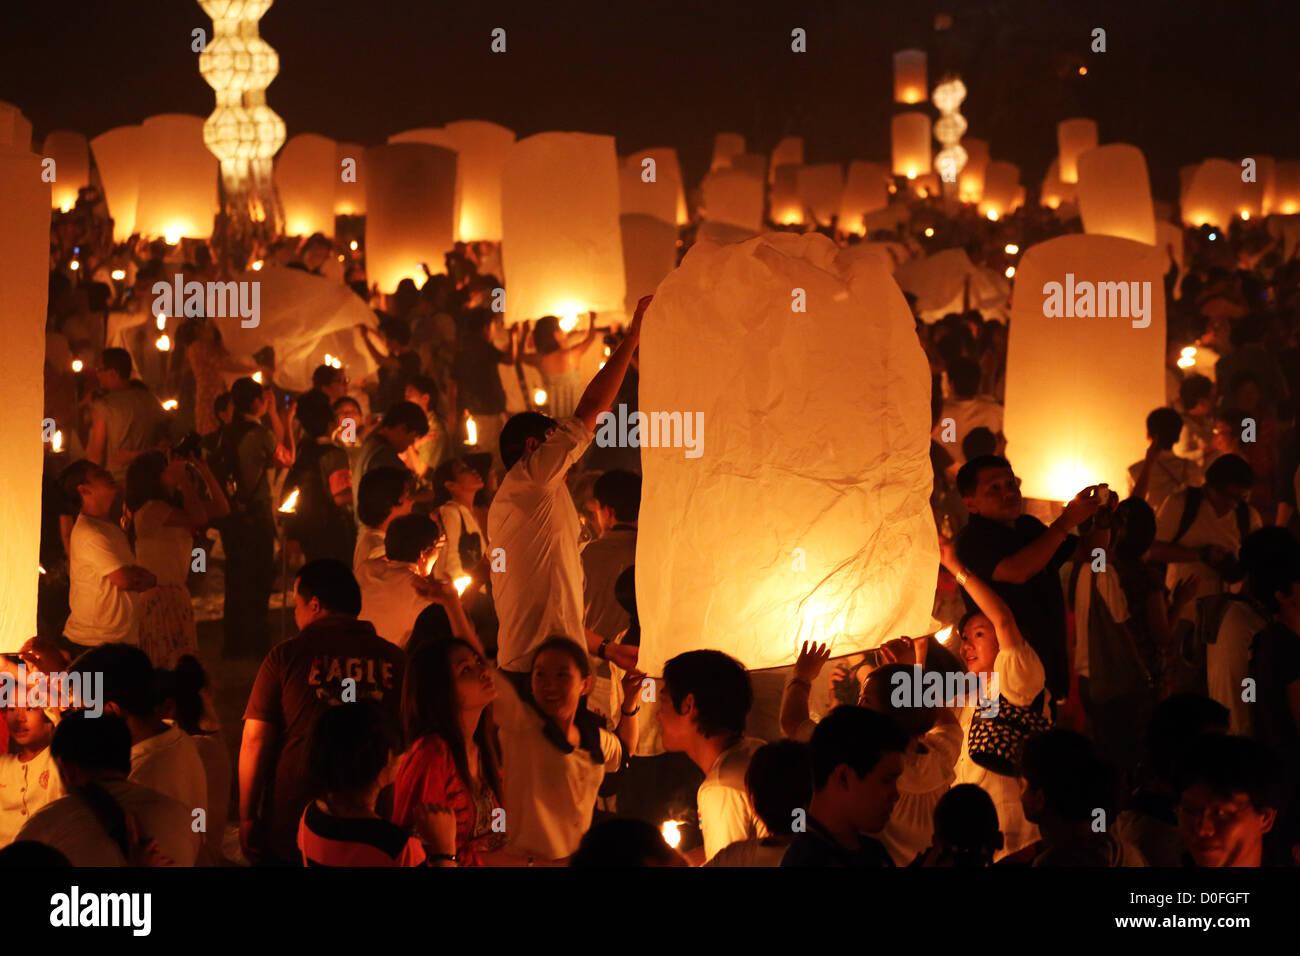 Chiang Mai, Thailand. 24. November 2012. Khom Loy Laternen an der Yee Peng Odds schwimmende Laterne Zeremonie Teil Stockfoto